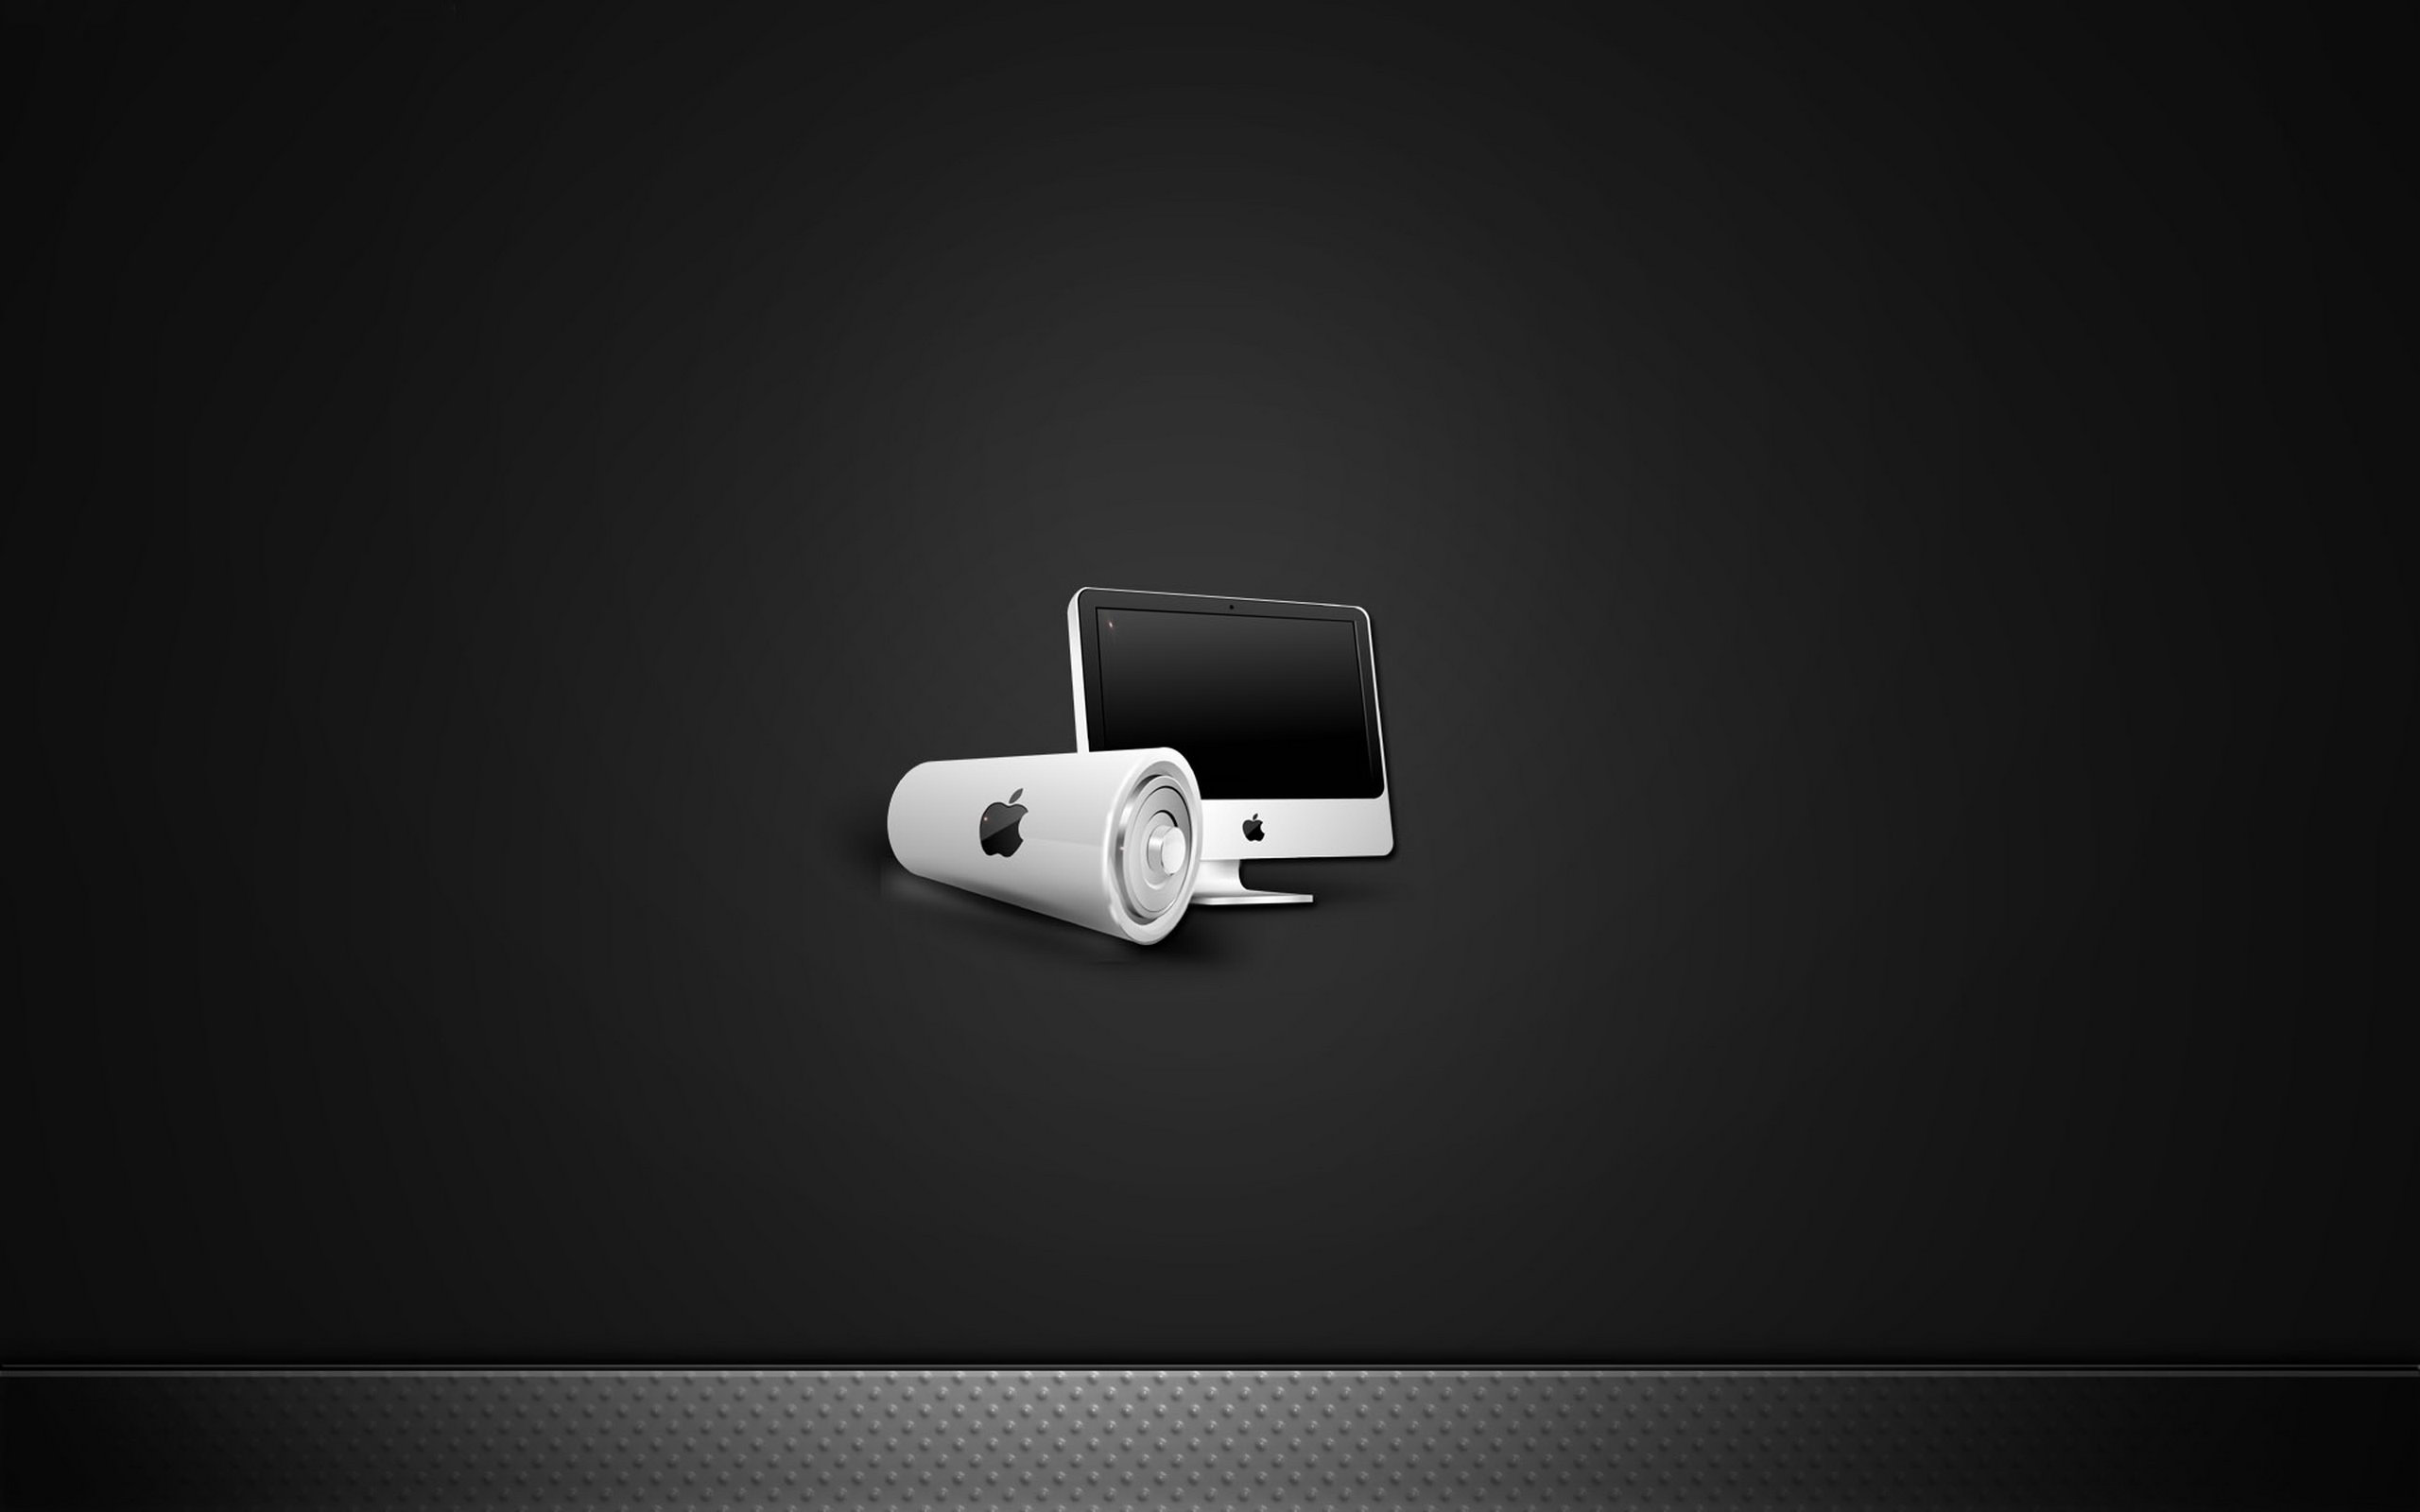 Best Apple Mac Desktop Wallpapers HD Black Mac Mac Background Mac 2560x1600